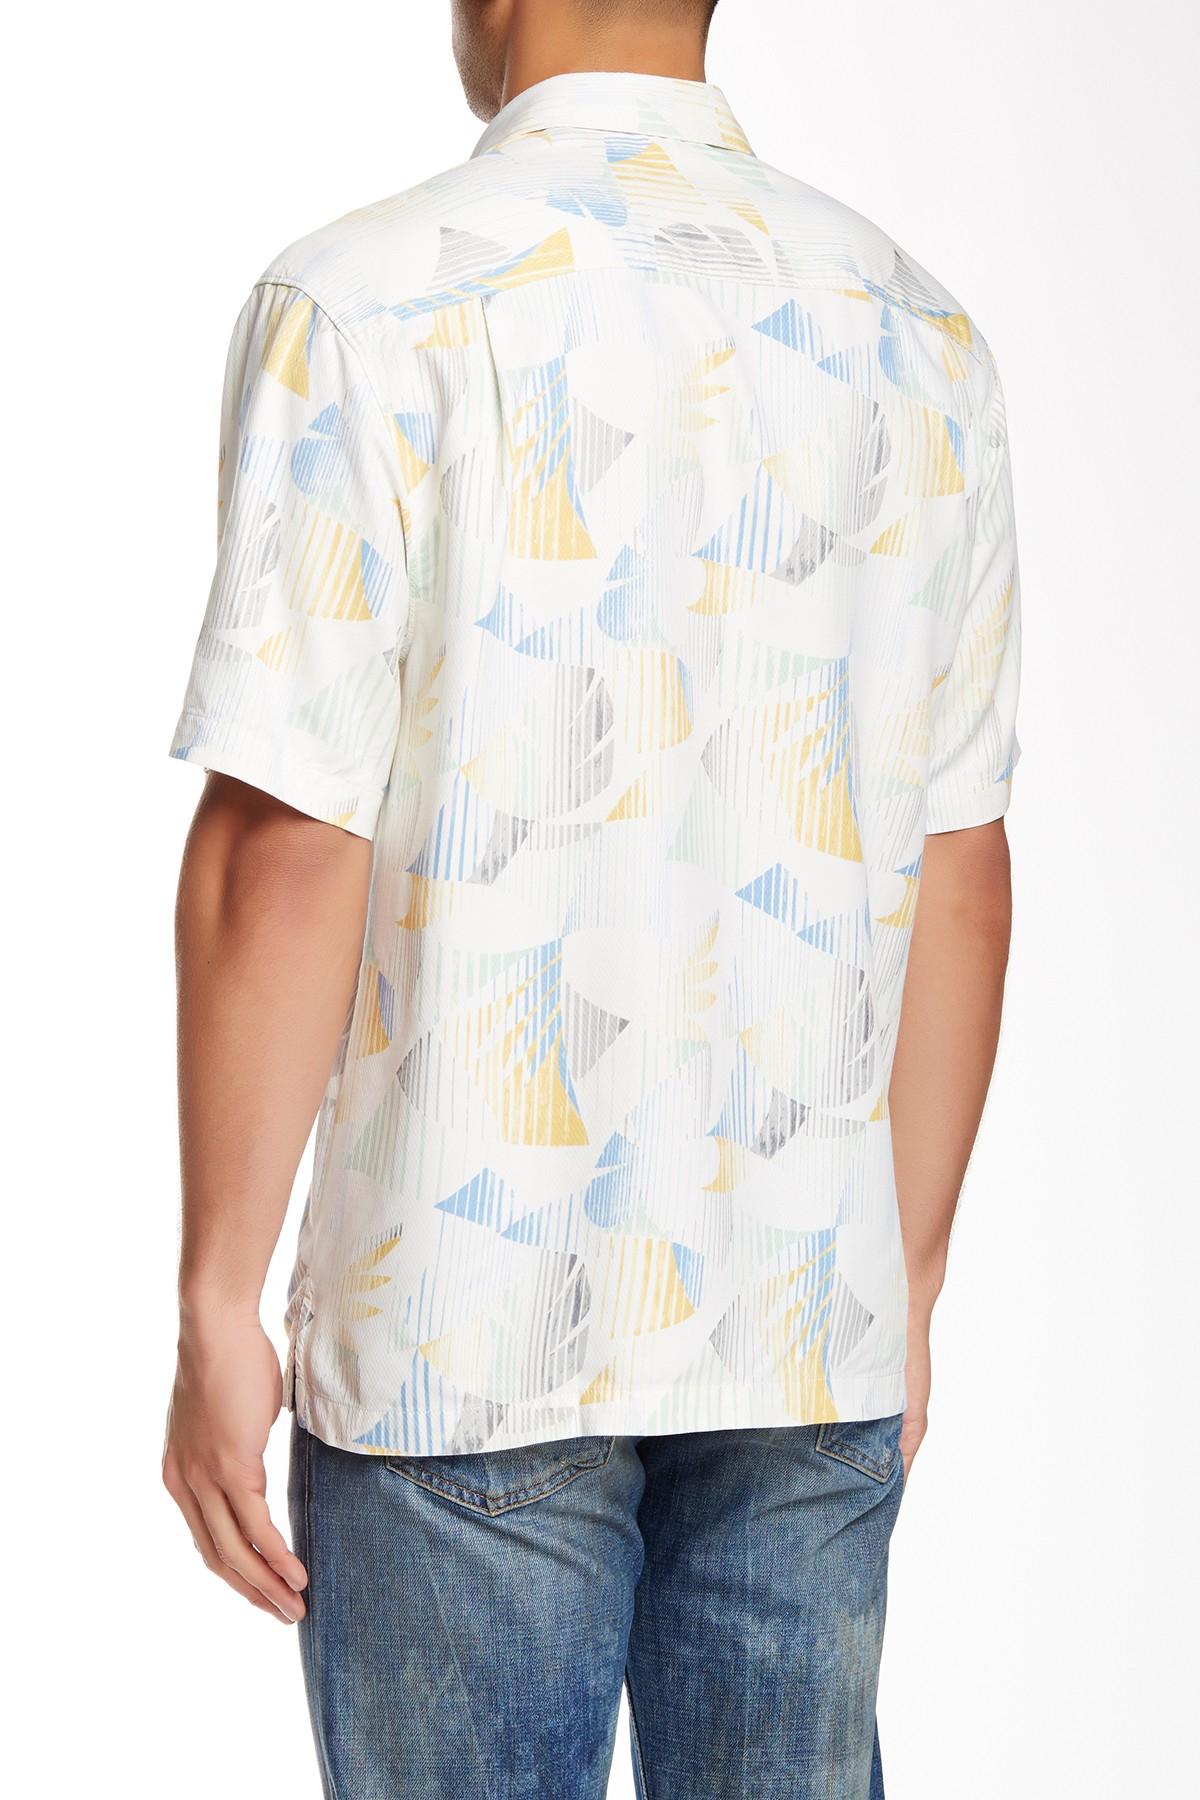 Tommy Bahama Lunar Lins Original Fit Short Sleeve Silk